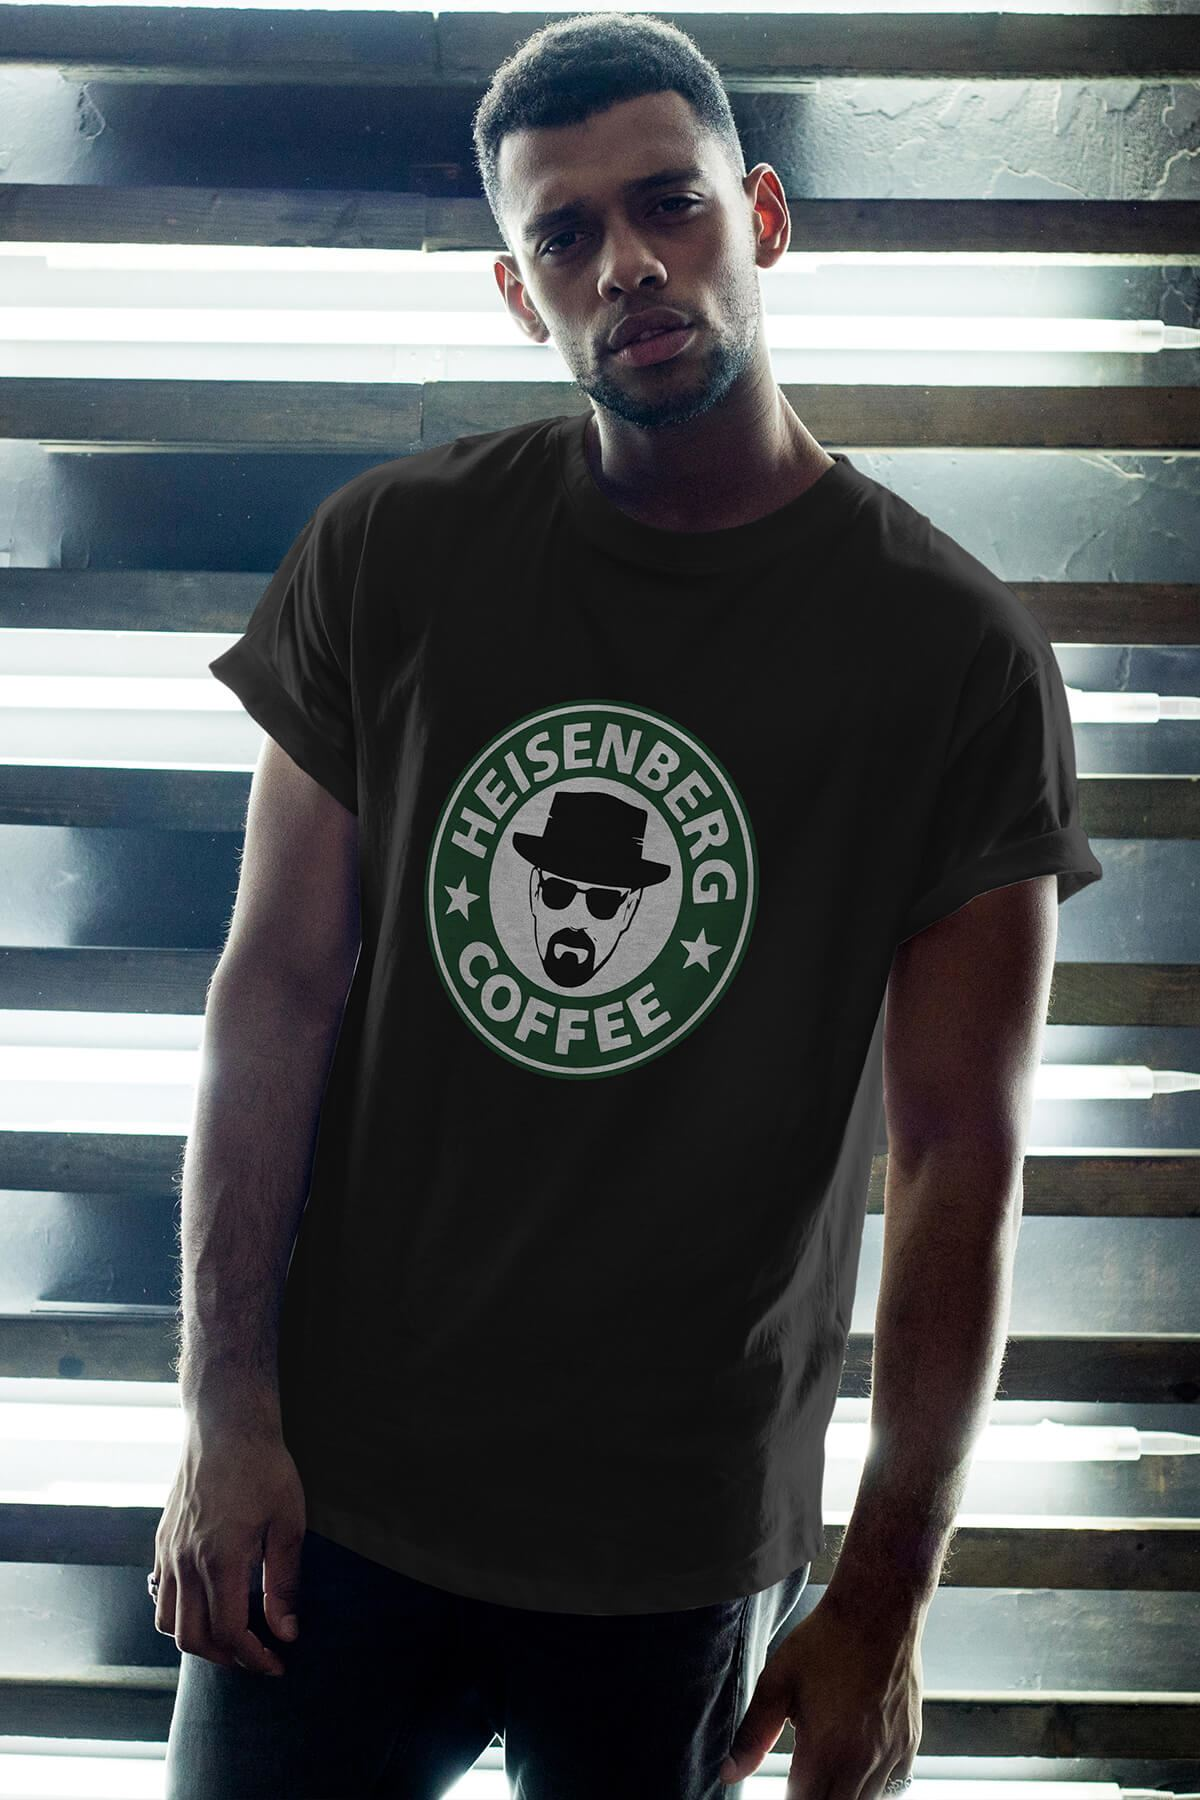 Breaking Bad Heisenberg 14 Siyah Erkek Oversize Tshirt - Tişört